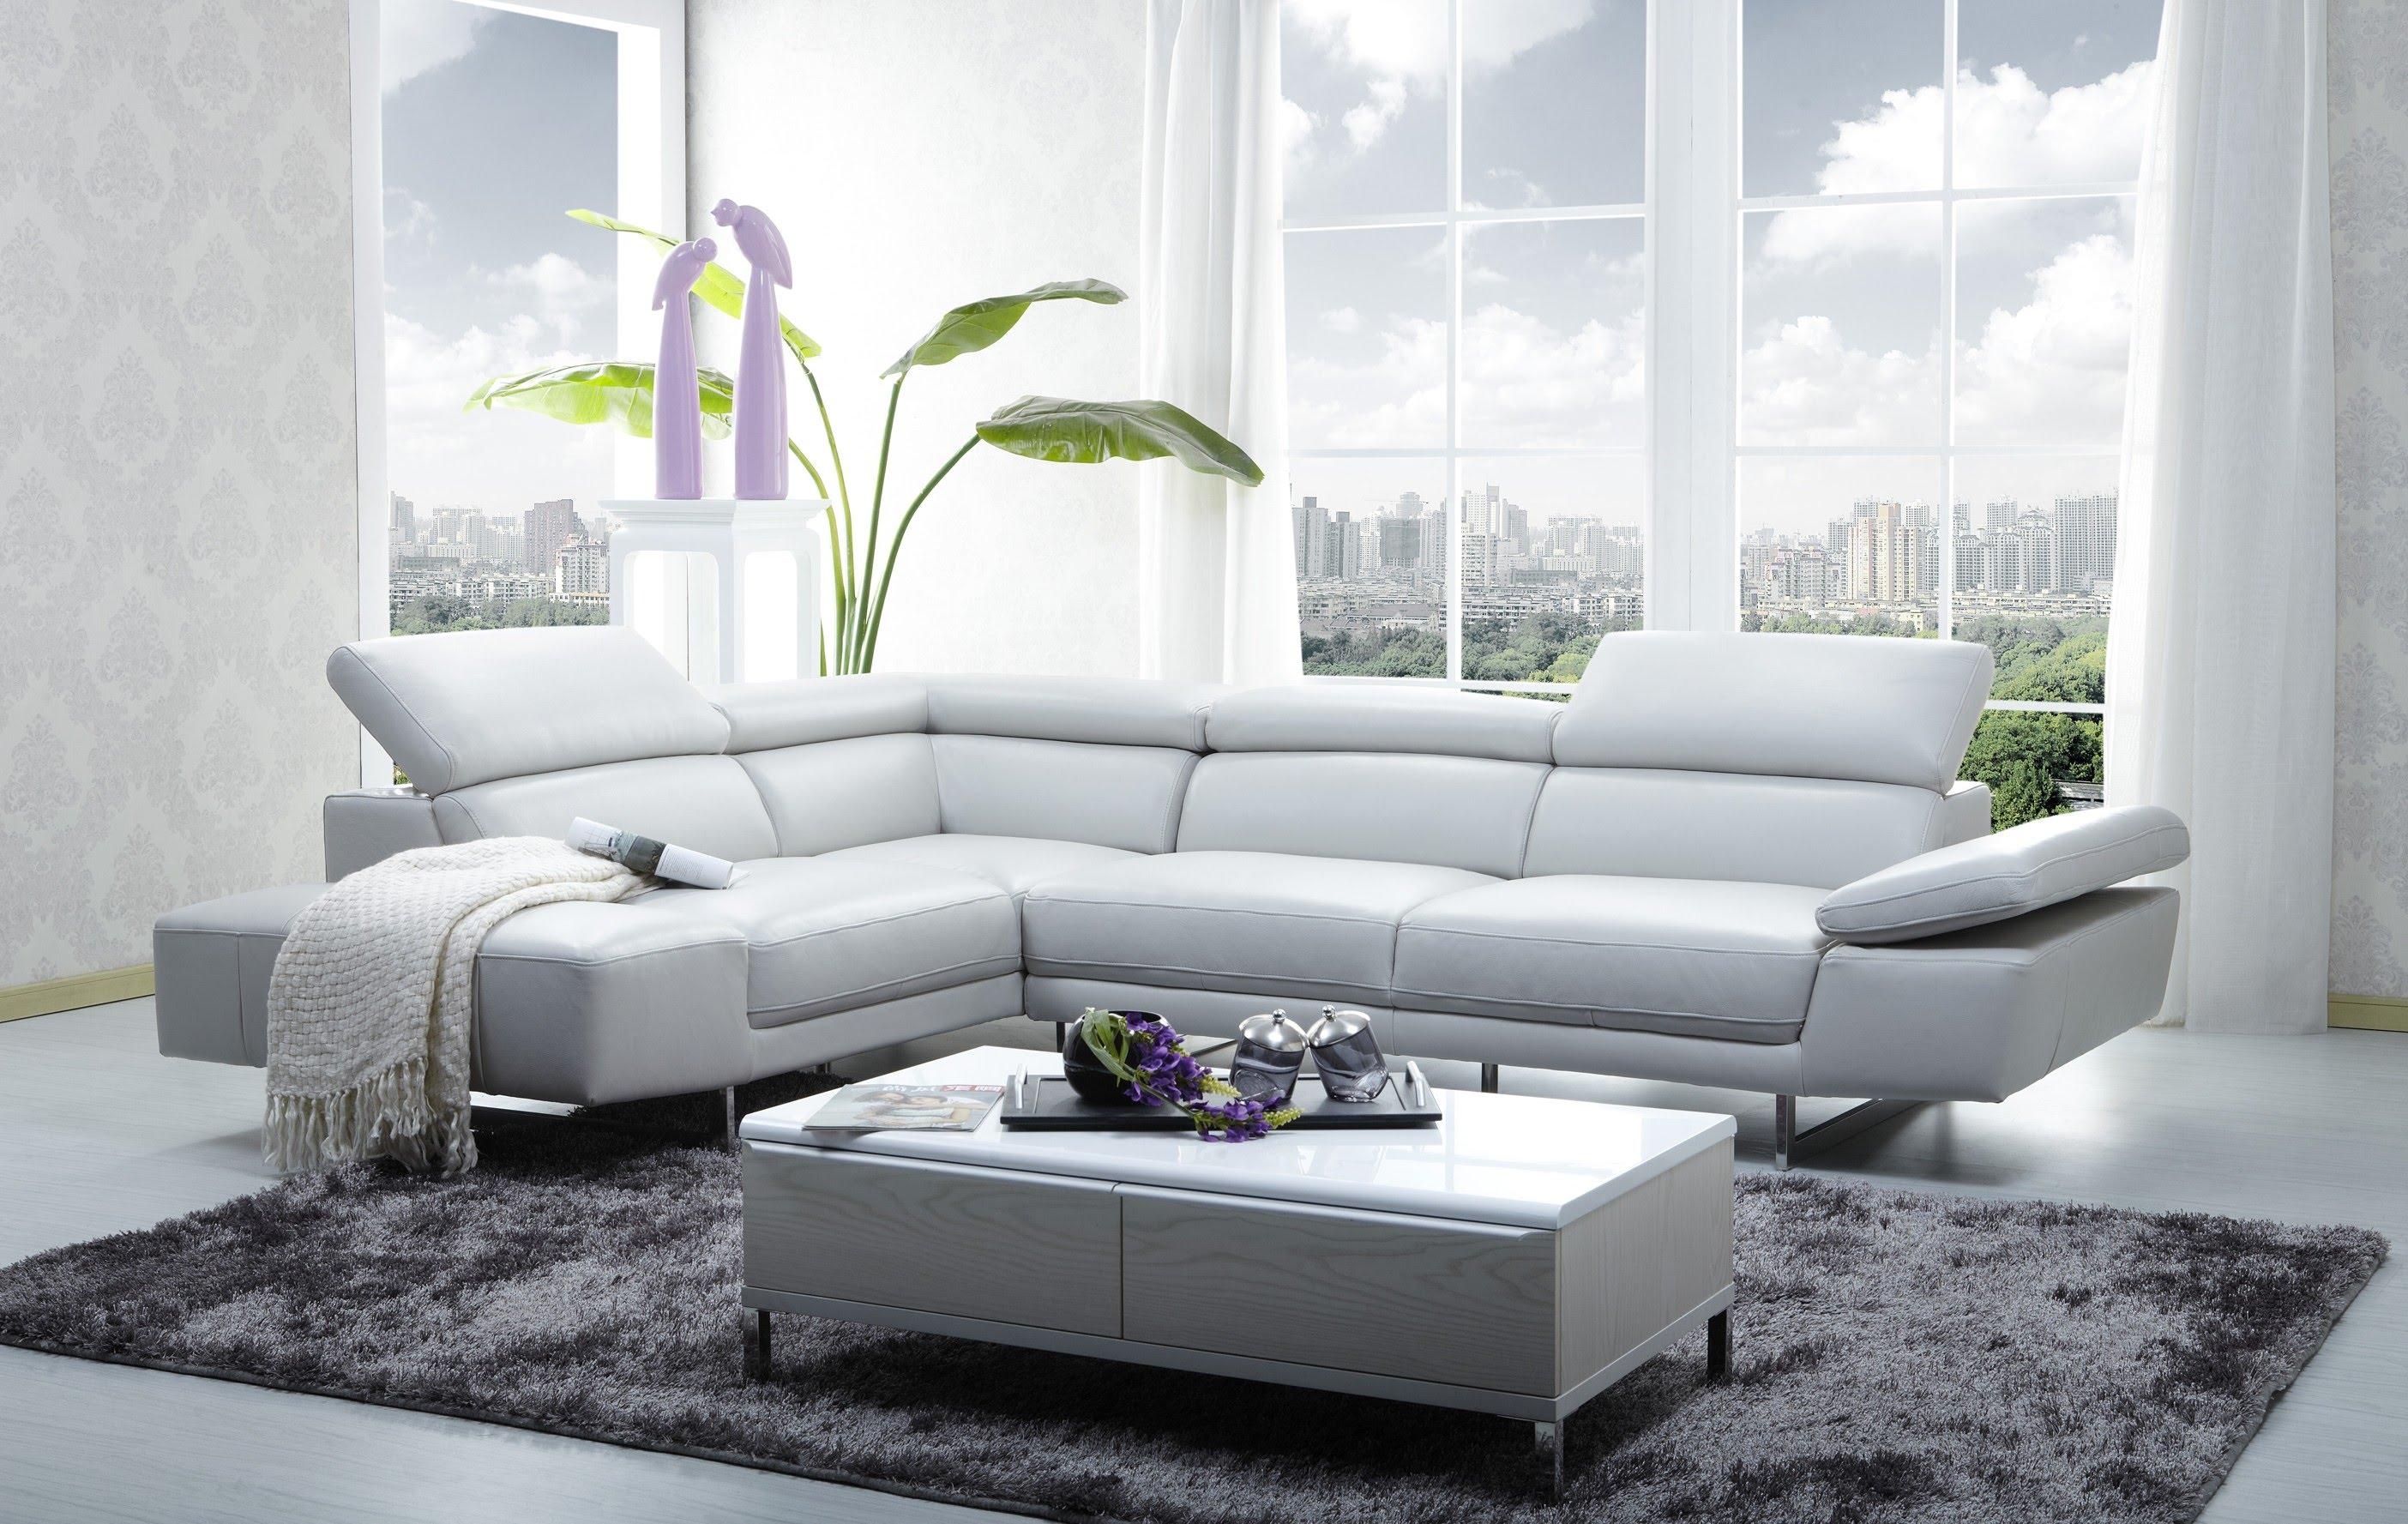 sofa-decoraca-moveis-santos-2